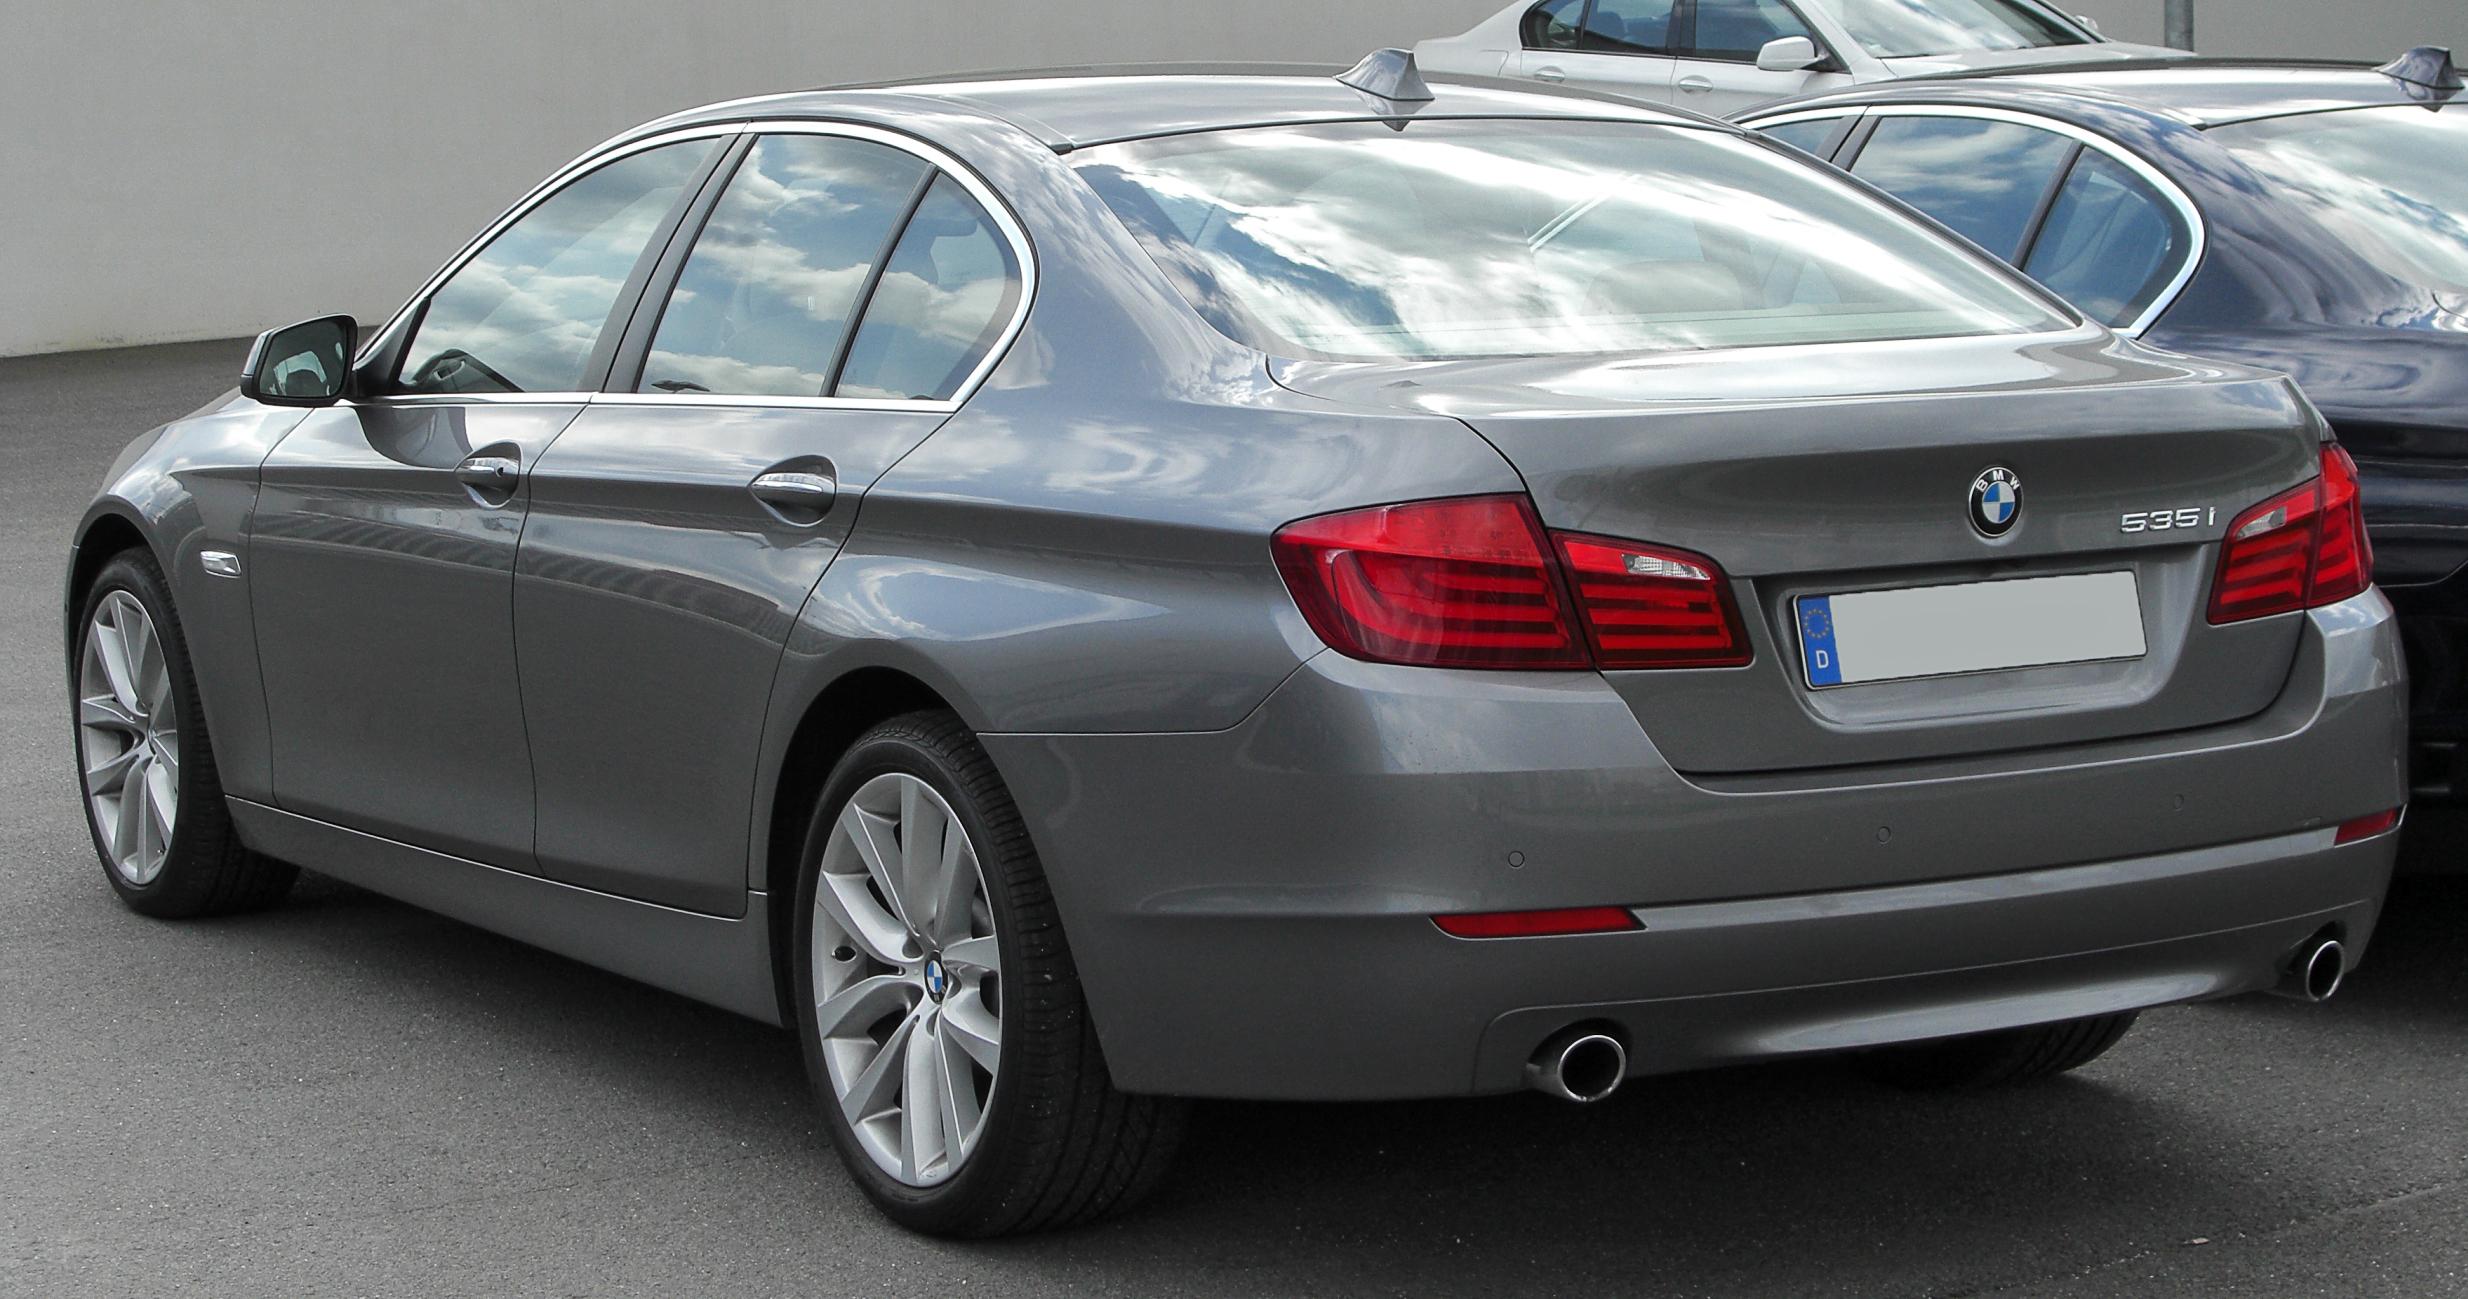 File:BMW 535i (F10) rear 20100410 jpg - Wikimedia Commons